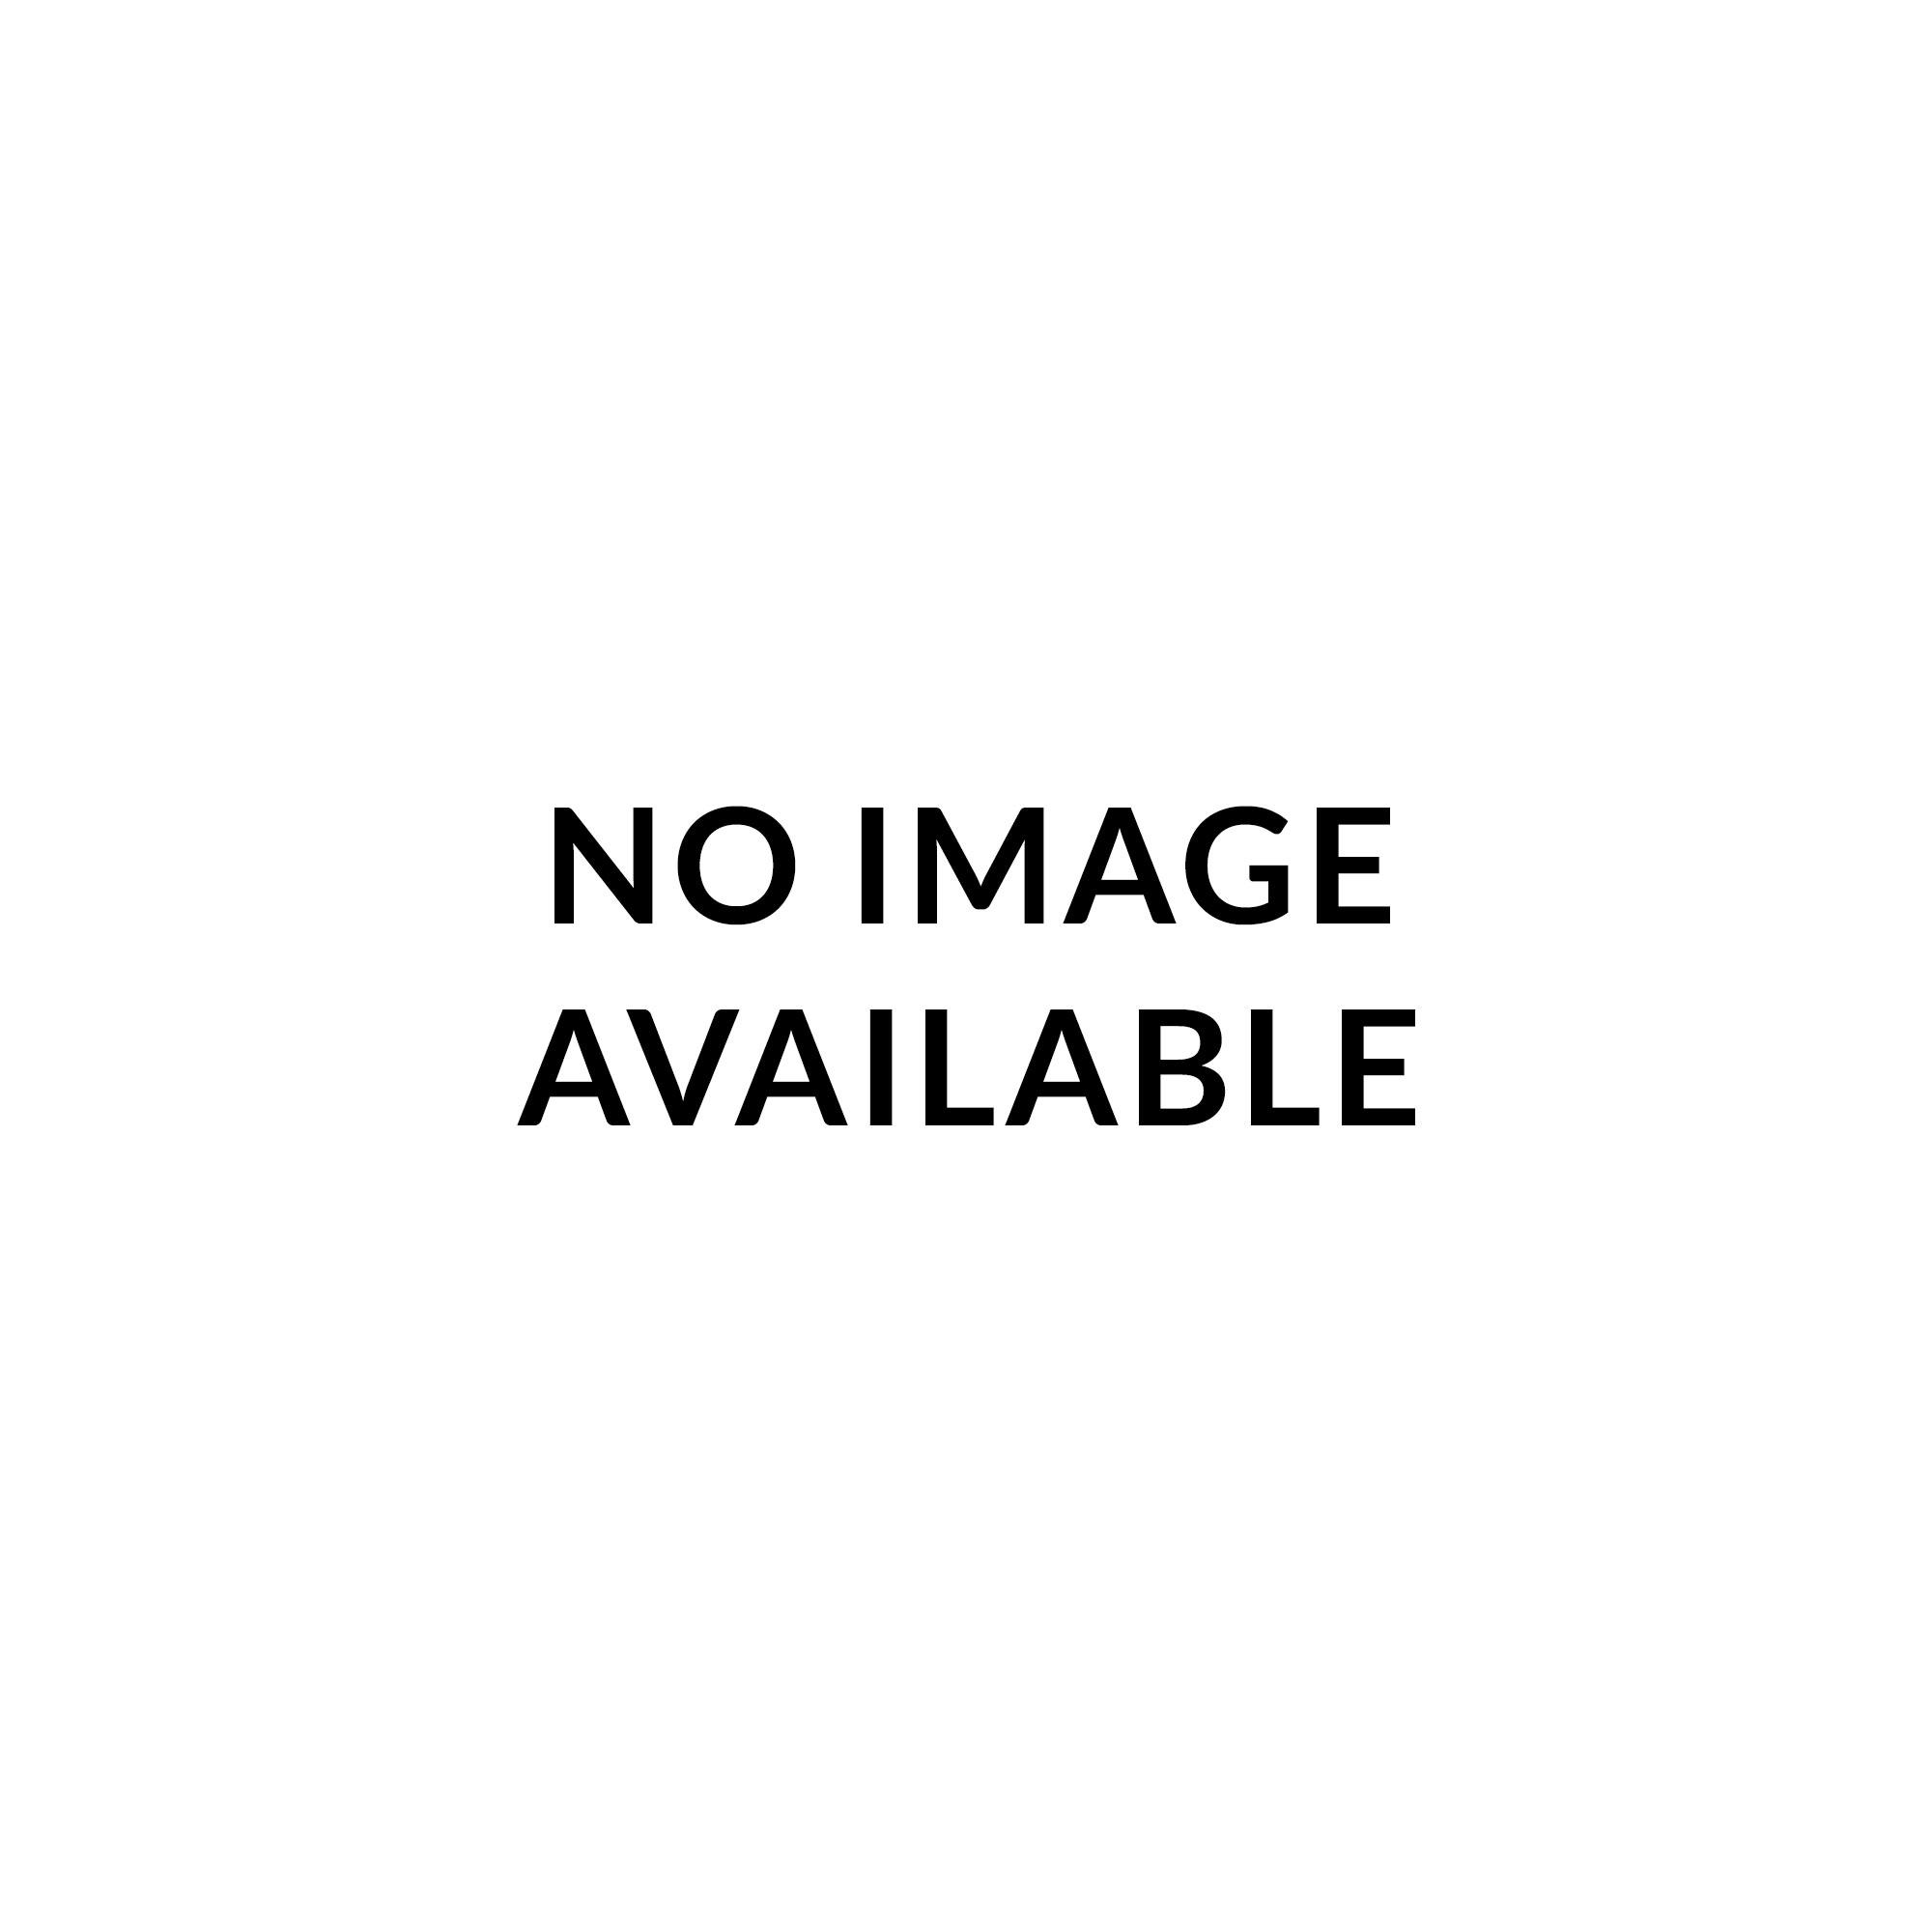 D'Addario NYXL High Carbon Plain Steel Single Strings (2-Pack)